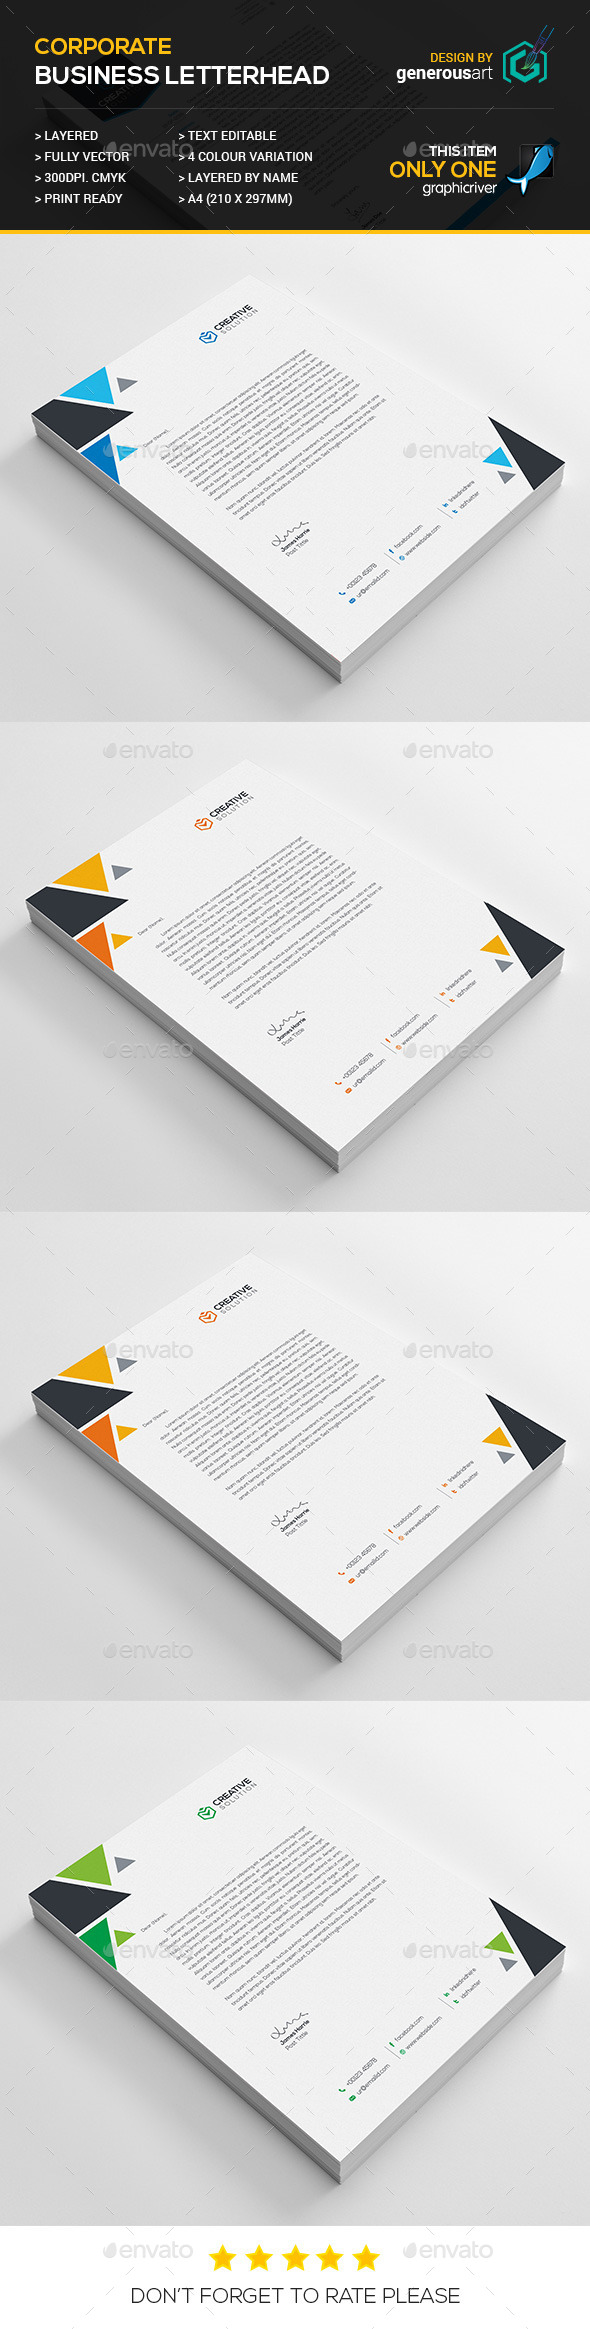 GraphicRiver Business Letterhead 11931148